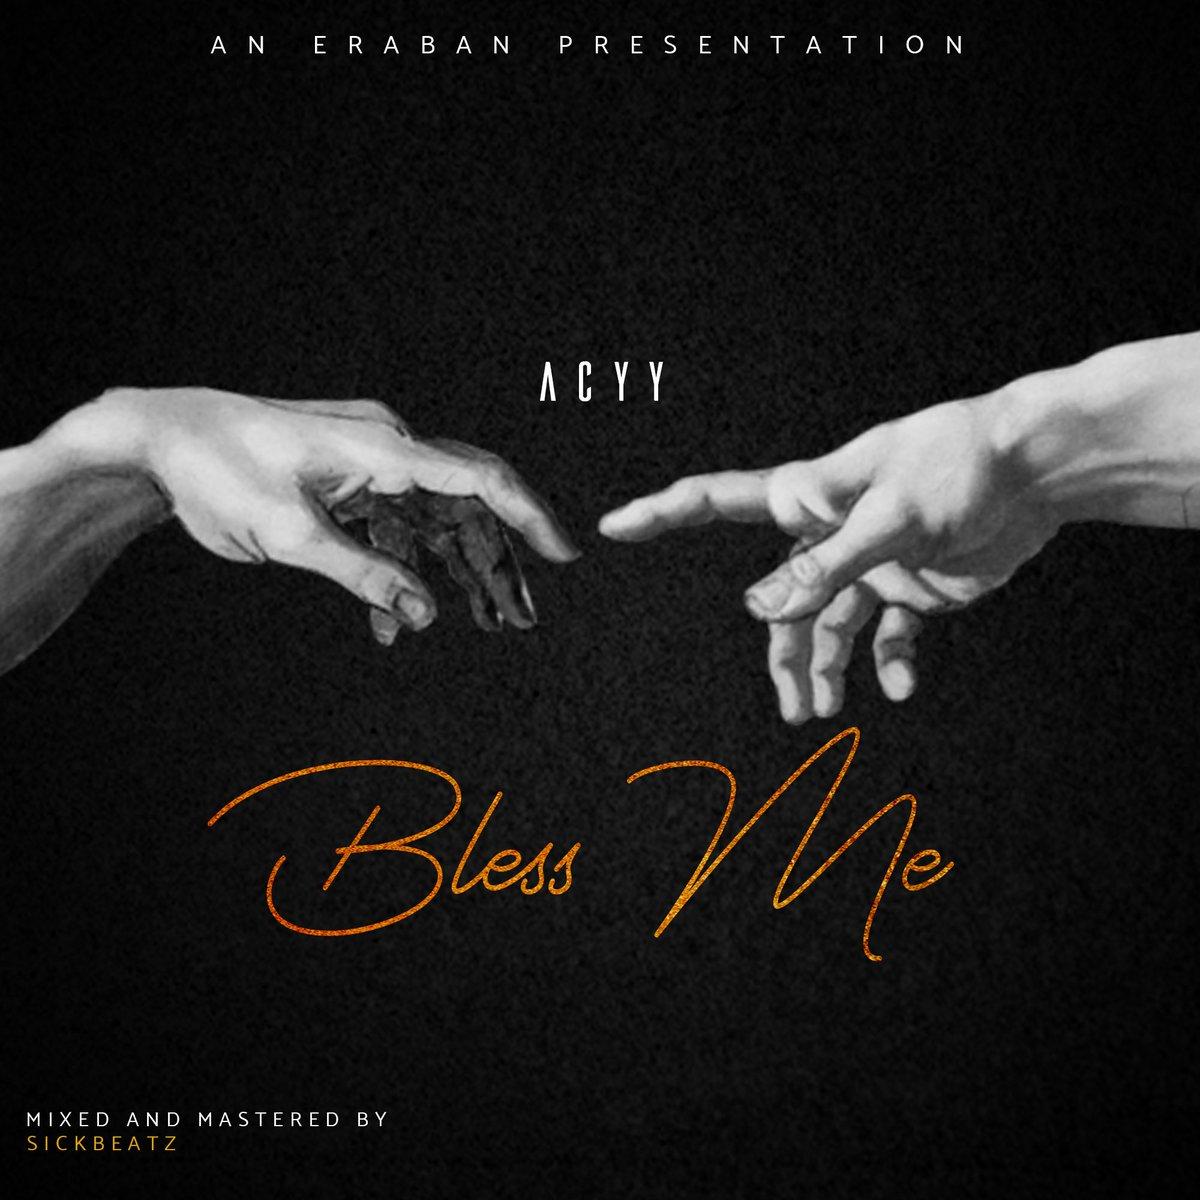 ACYY - Bless Me. Drops Next🙏 #BlessMe